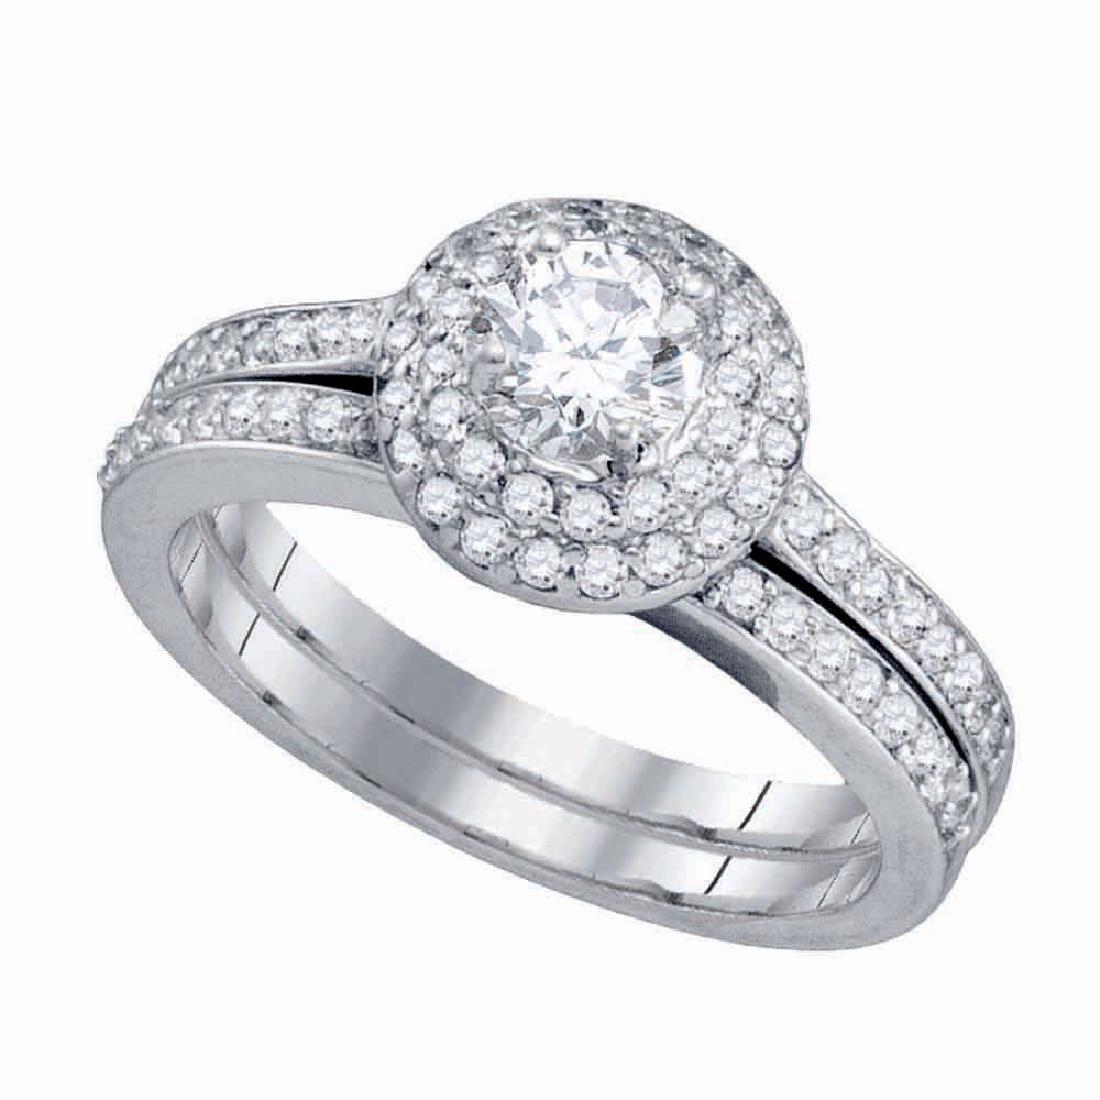 14kt White Gold Round Diamond Bridal Wedding Engagement